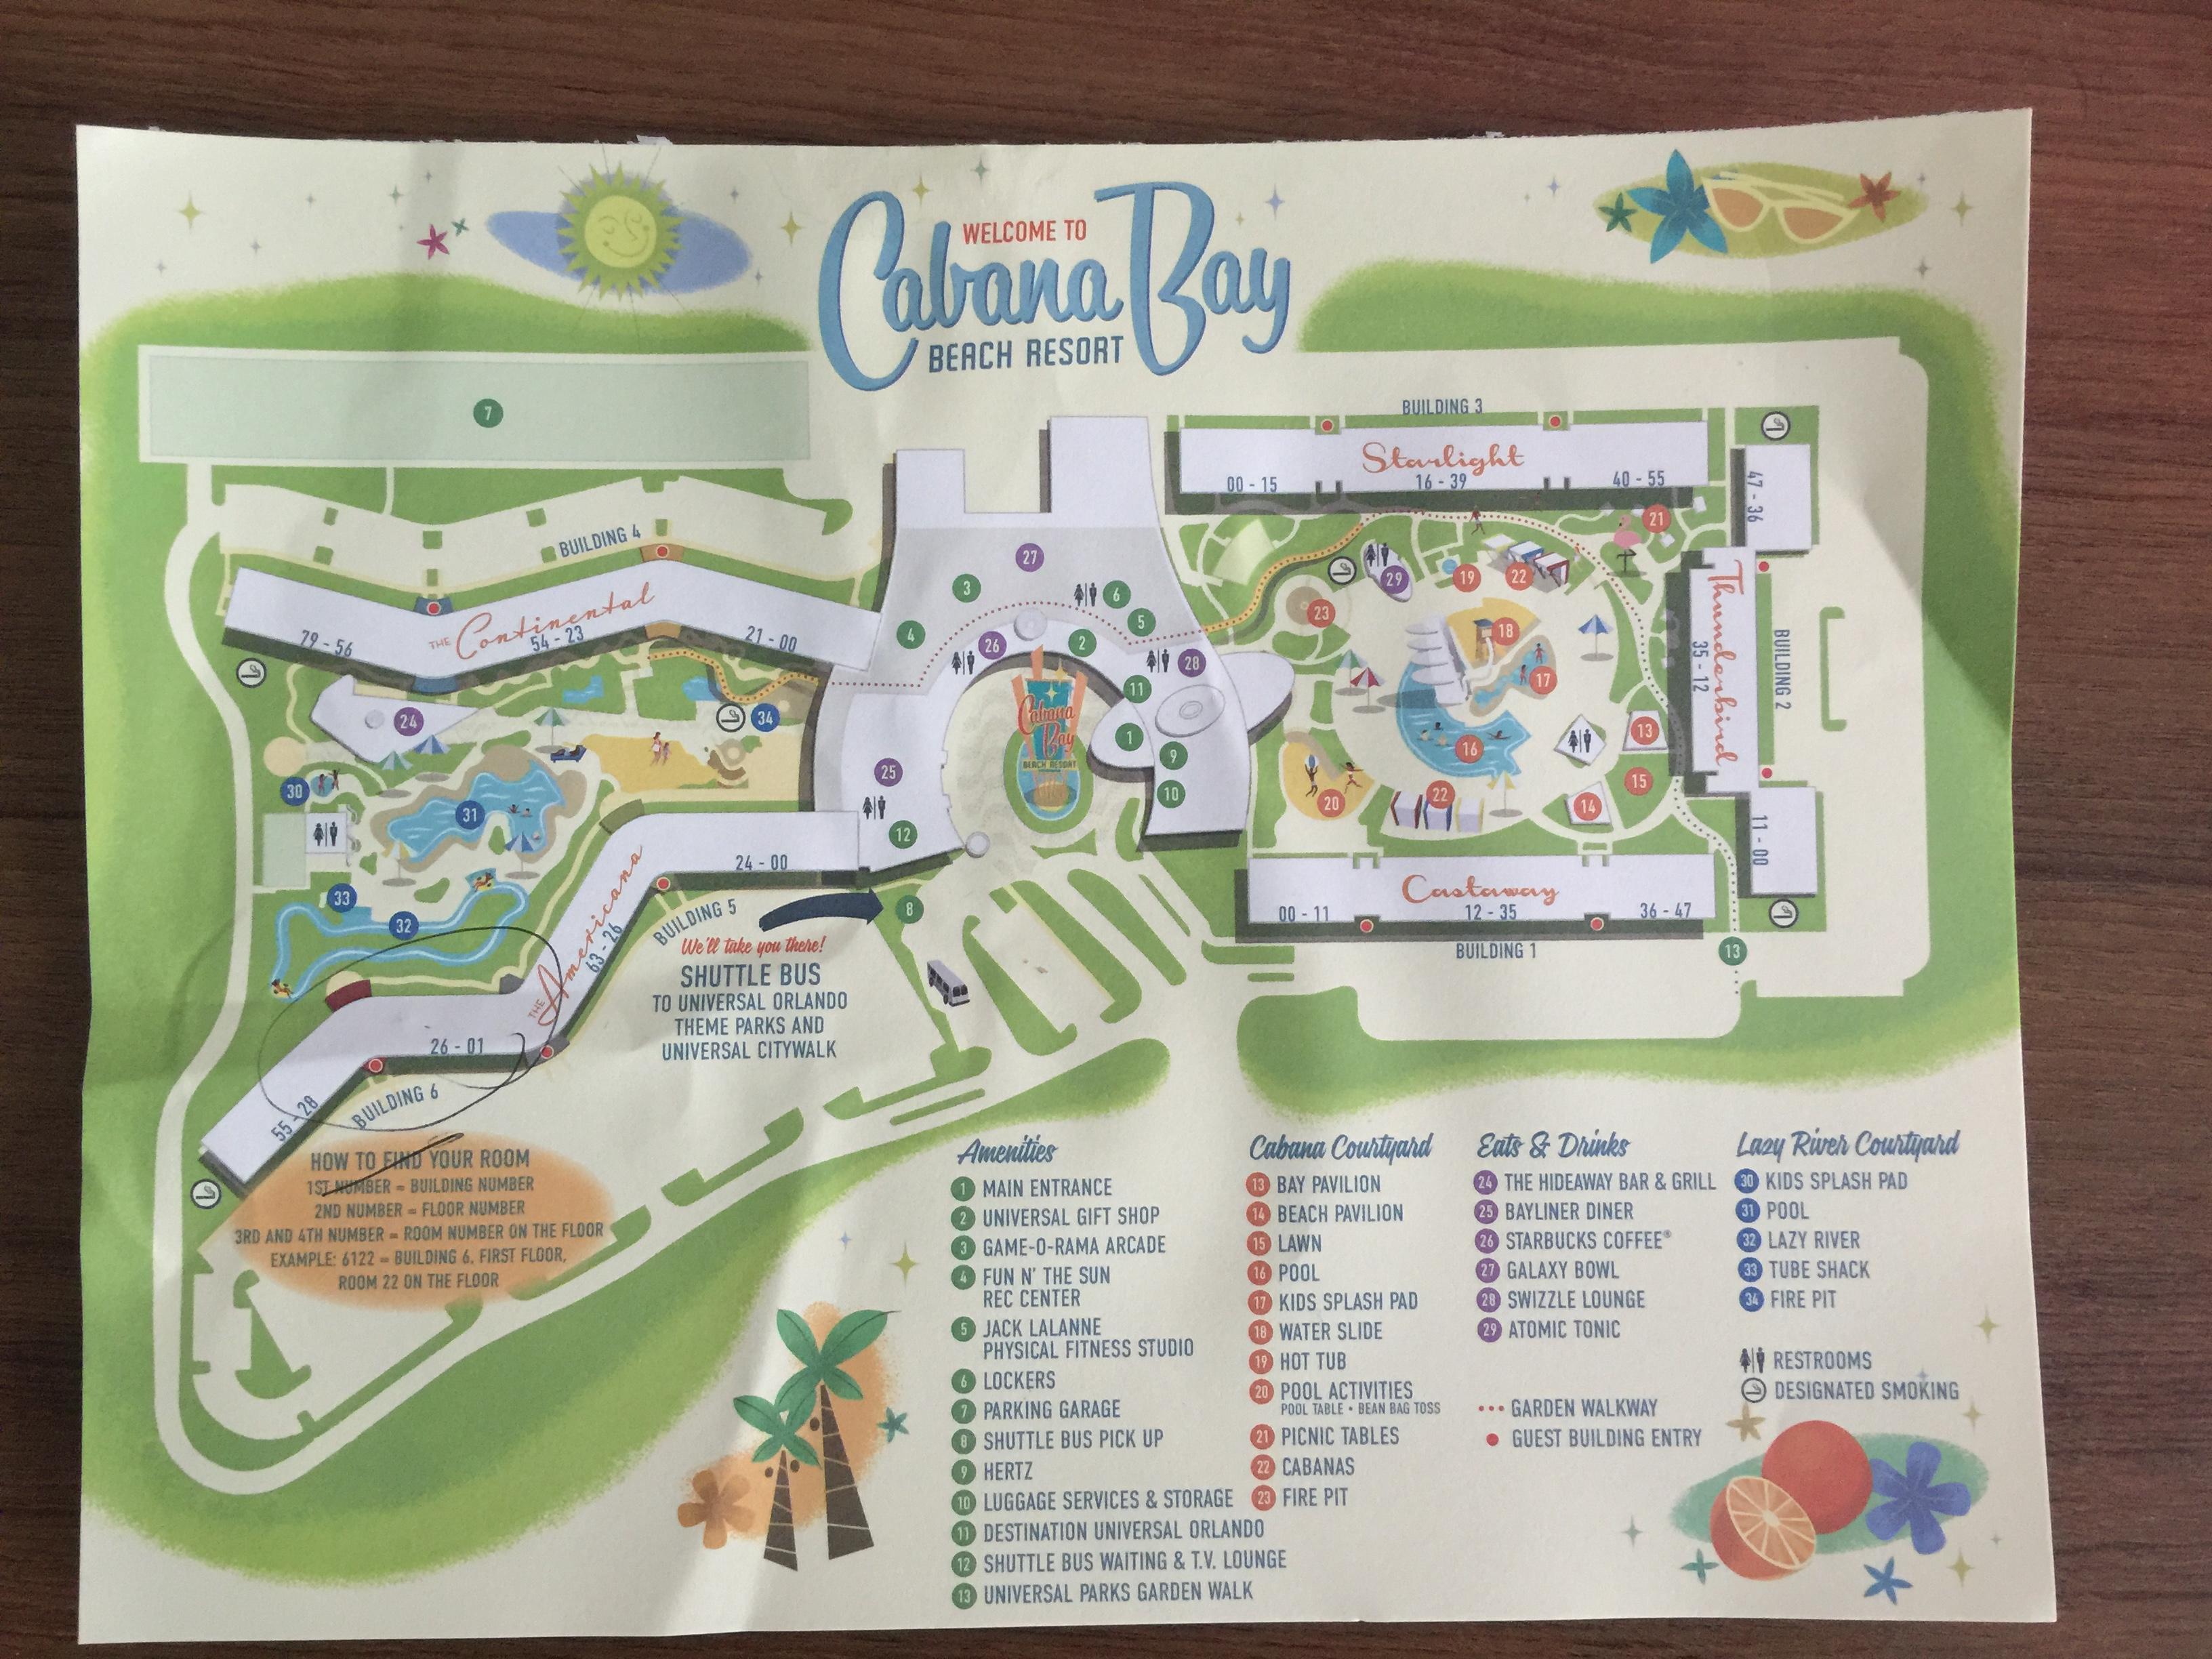 Cabana Bay Beach Resort at Universal Studios Orlando